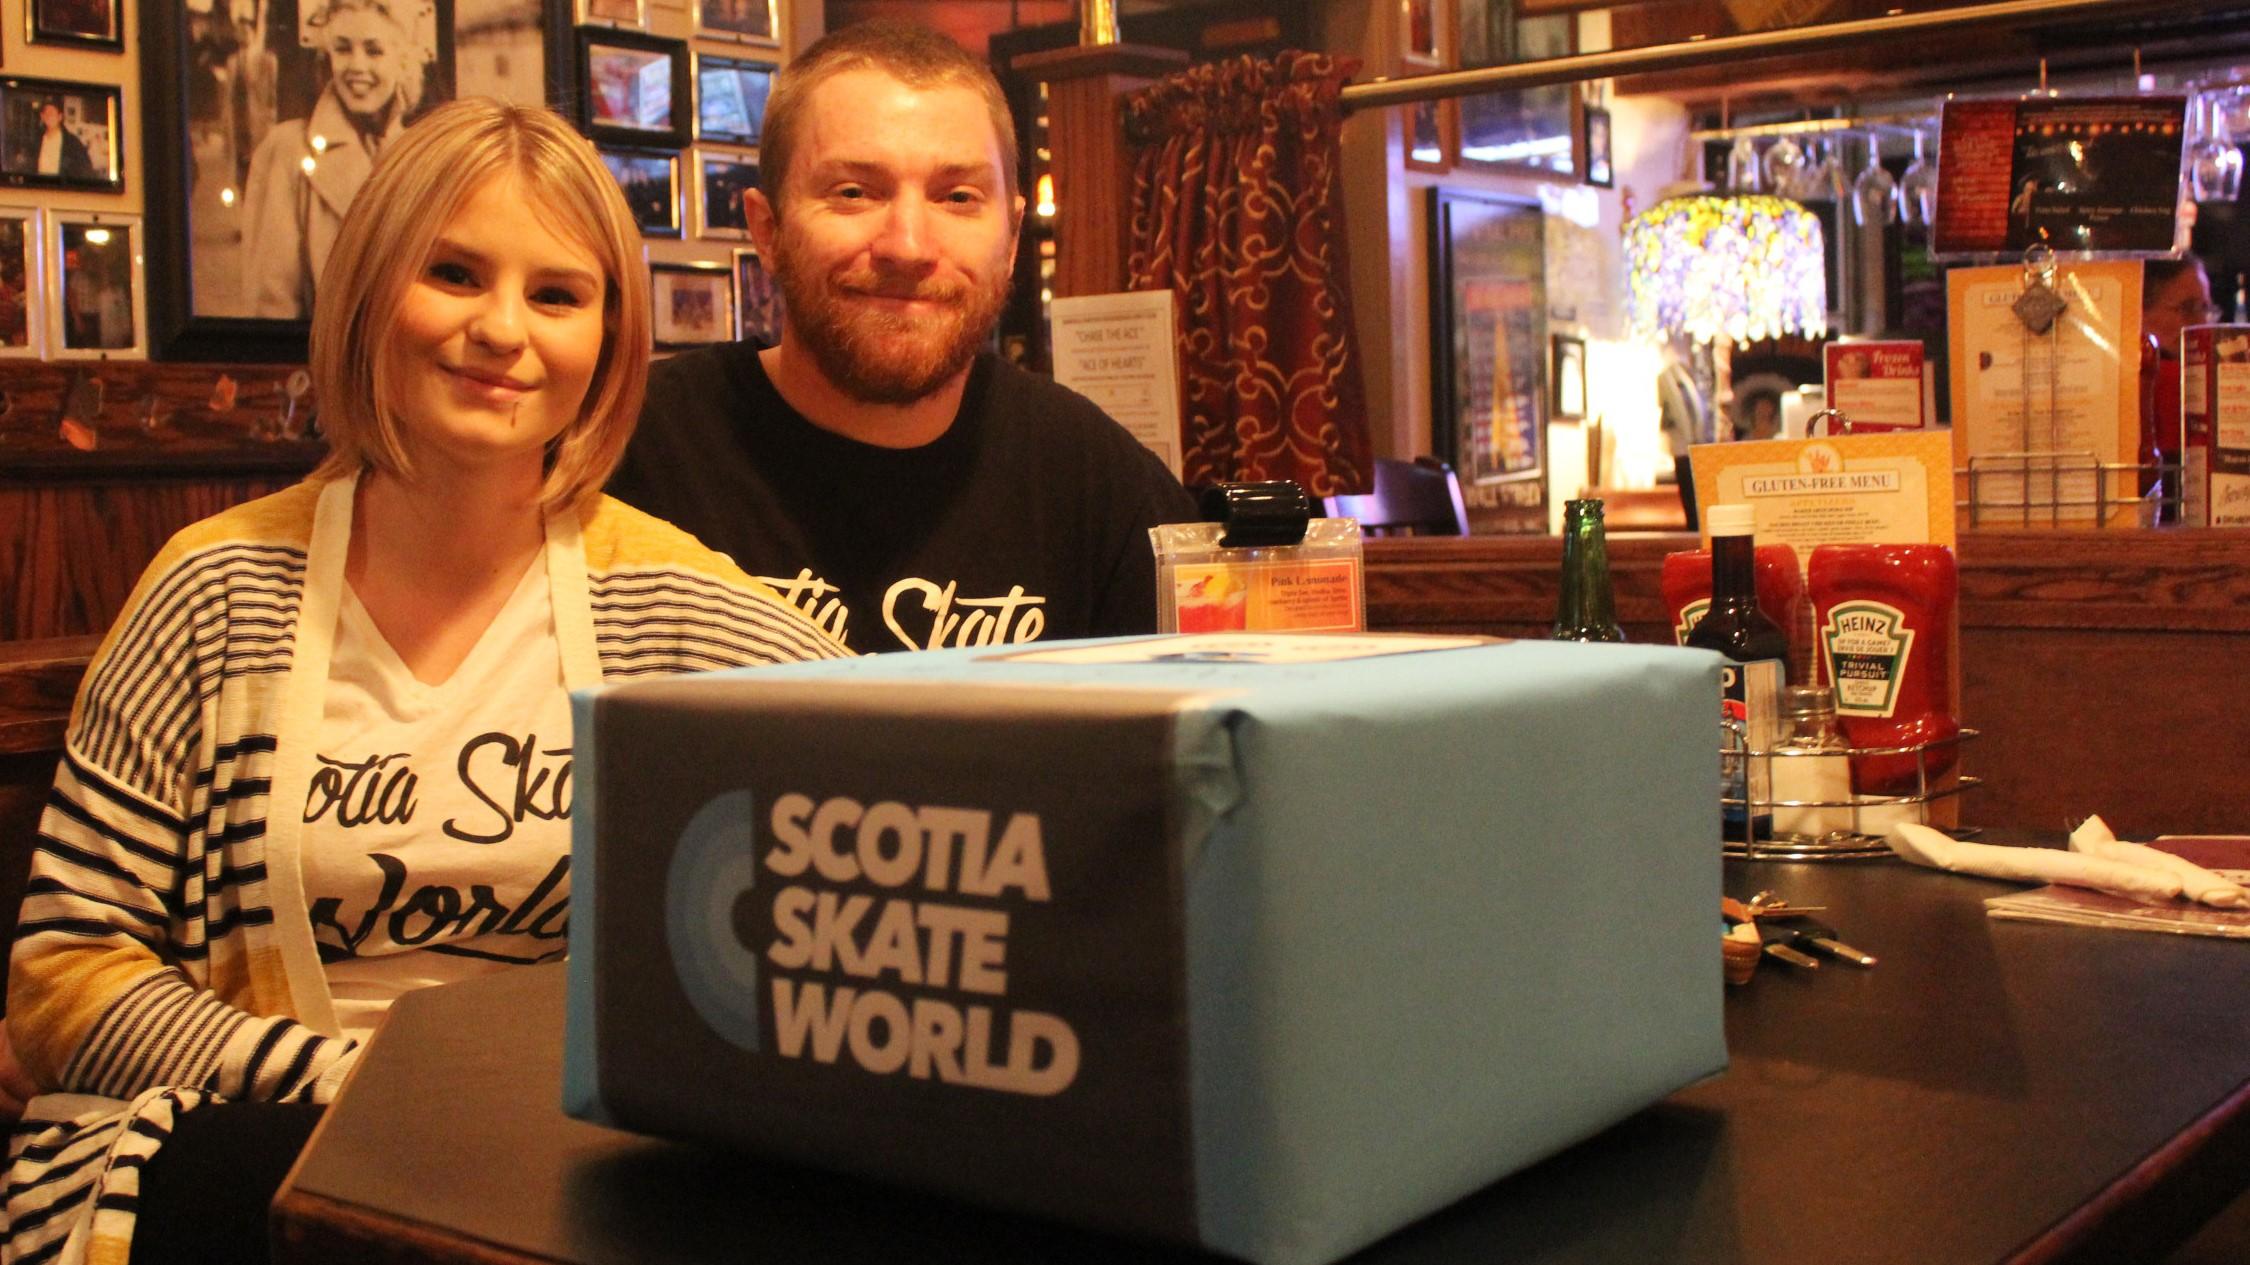 Craig McNally and his girlfriend Kelly Hutchinson at Saturday night's fundraising event.